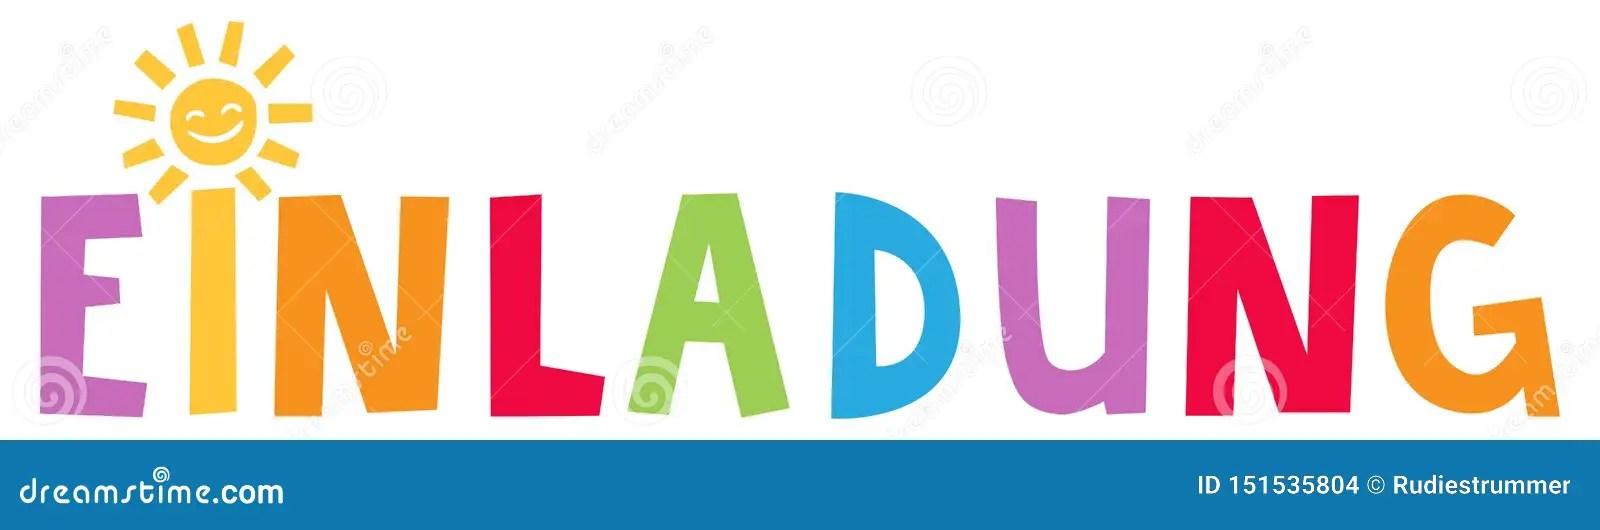 https www dreamstime com einladung german invitation colorful lettering einladung german invitation colorful lettering sun as dot i image151535804